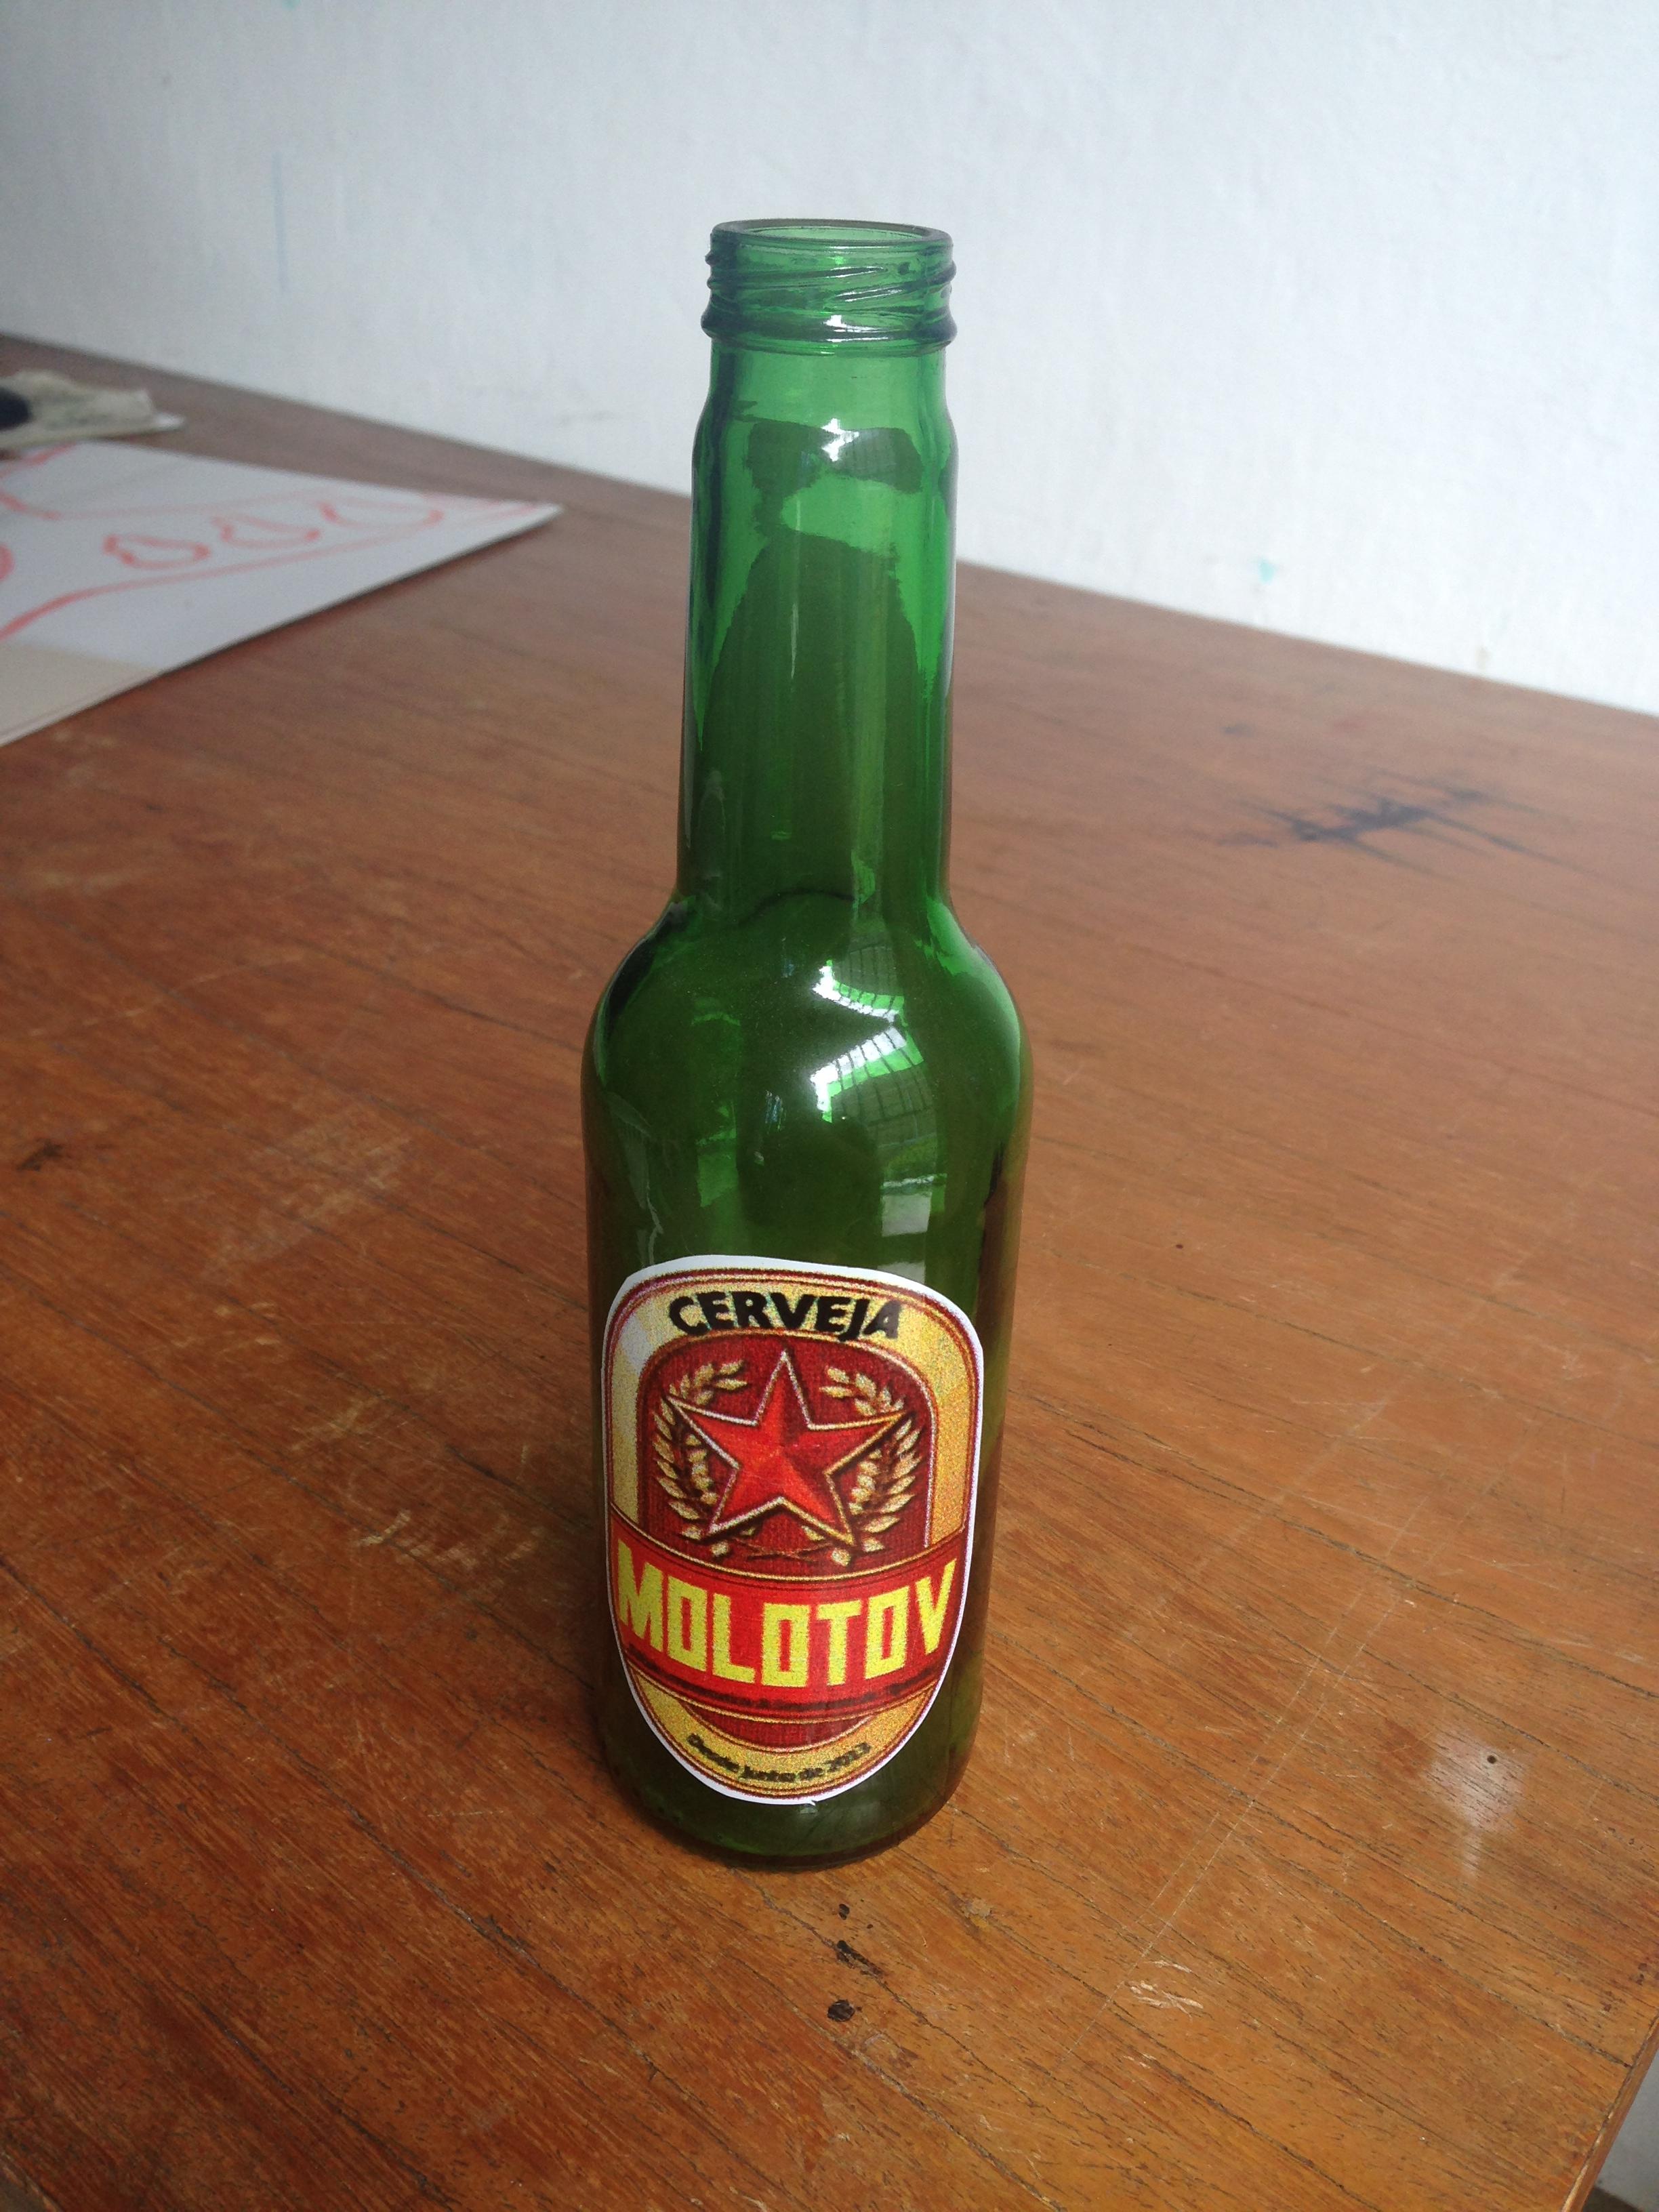 Cerveja Molotov